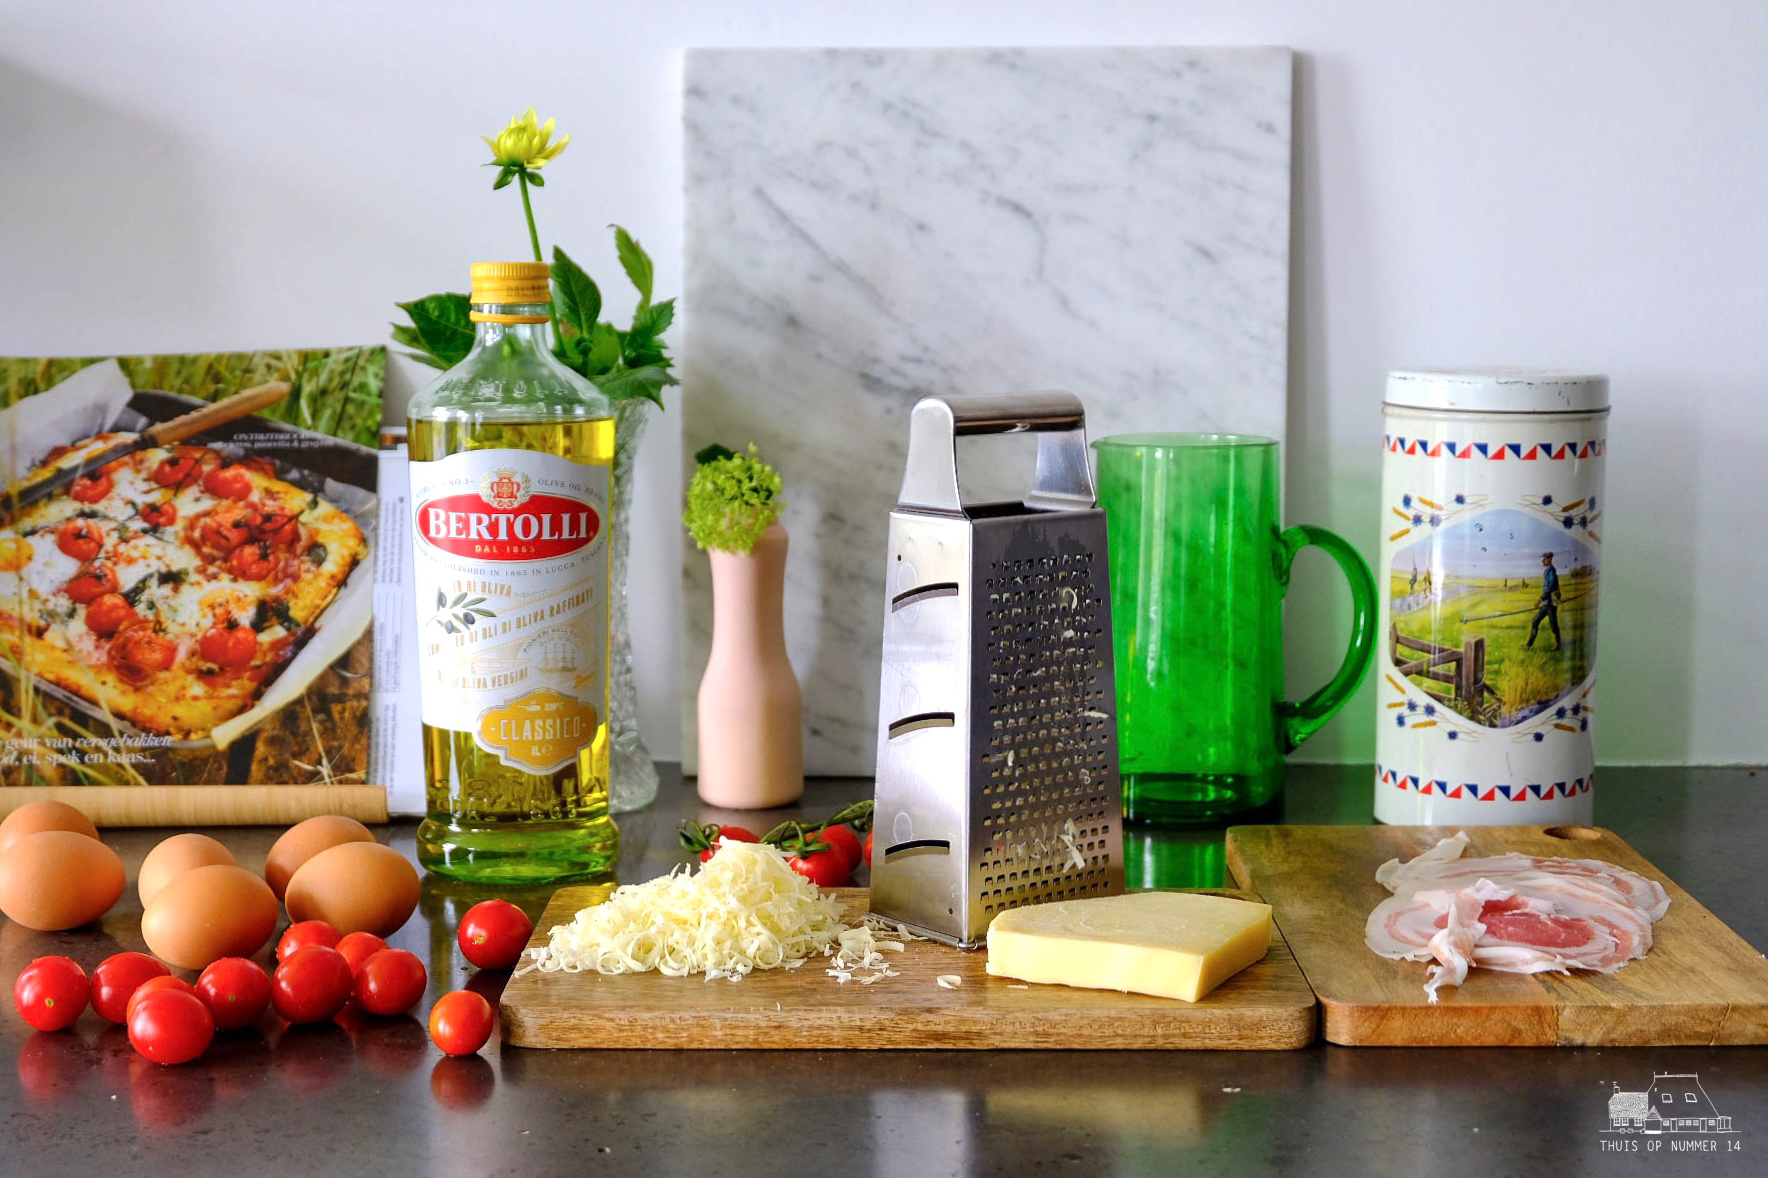 thuis op nummer 14 - Ontbijtbrood met eieren, pancetta en gruyère.